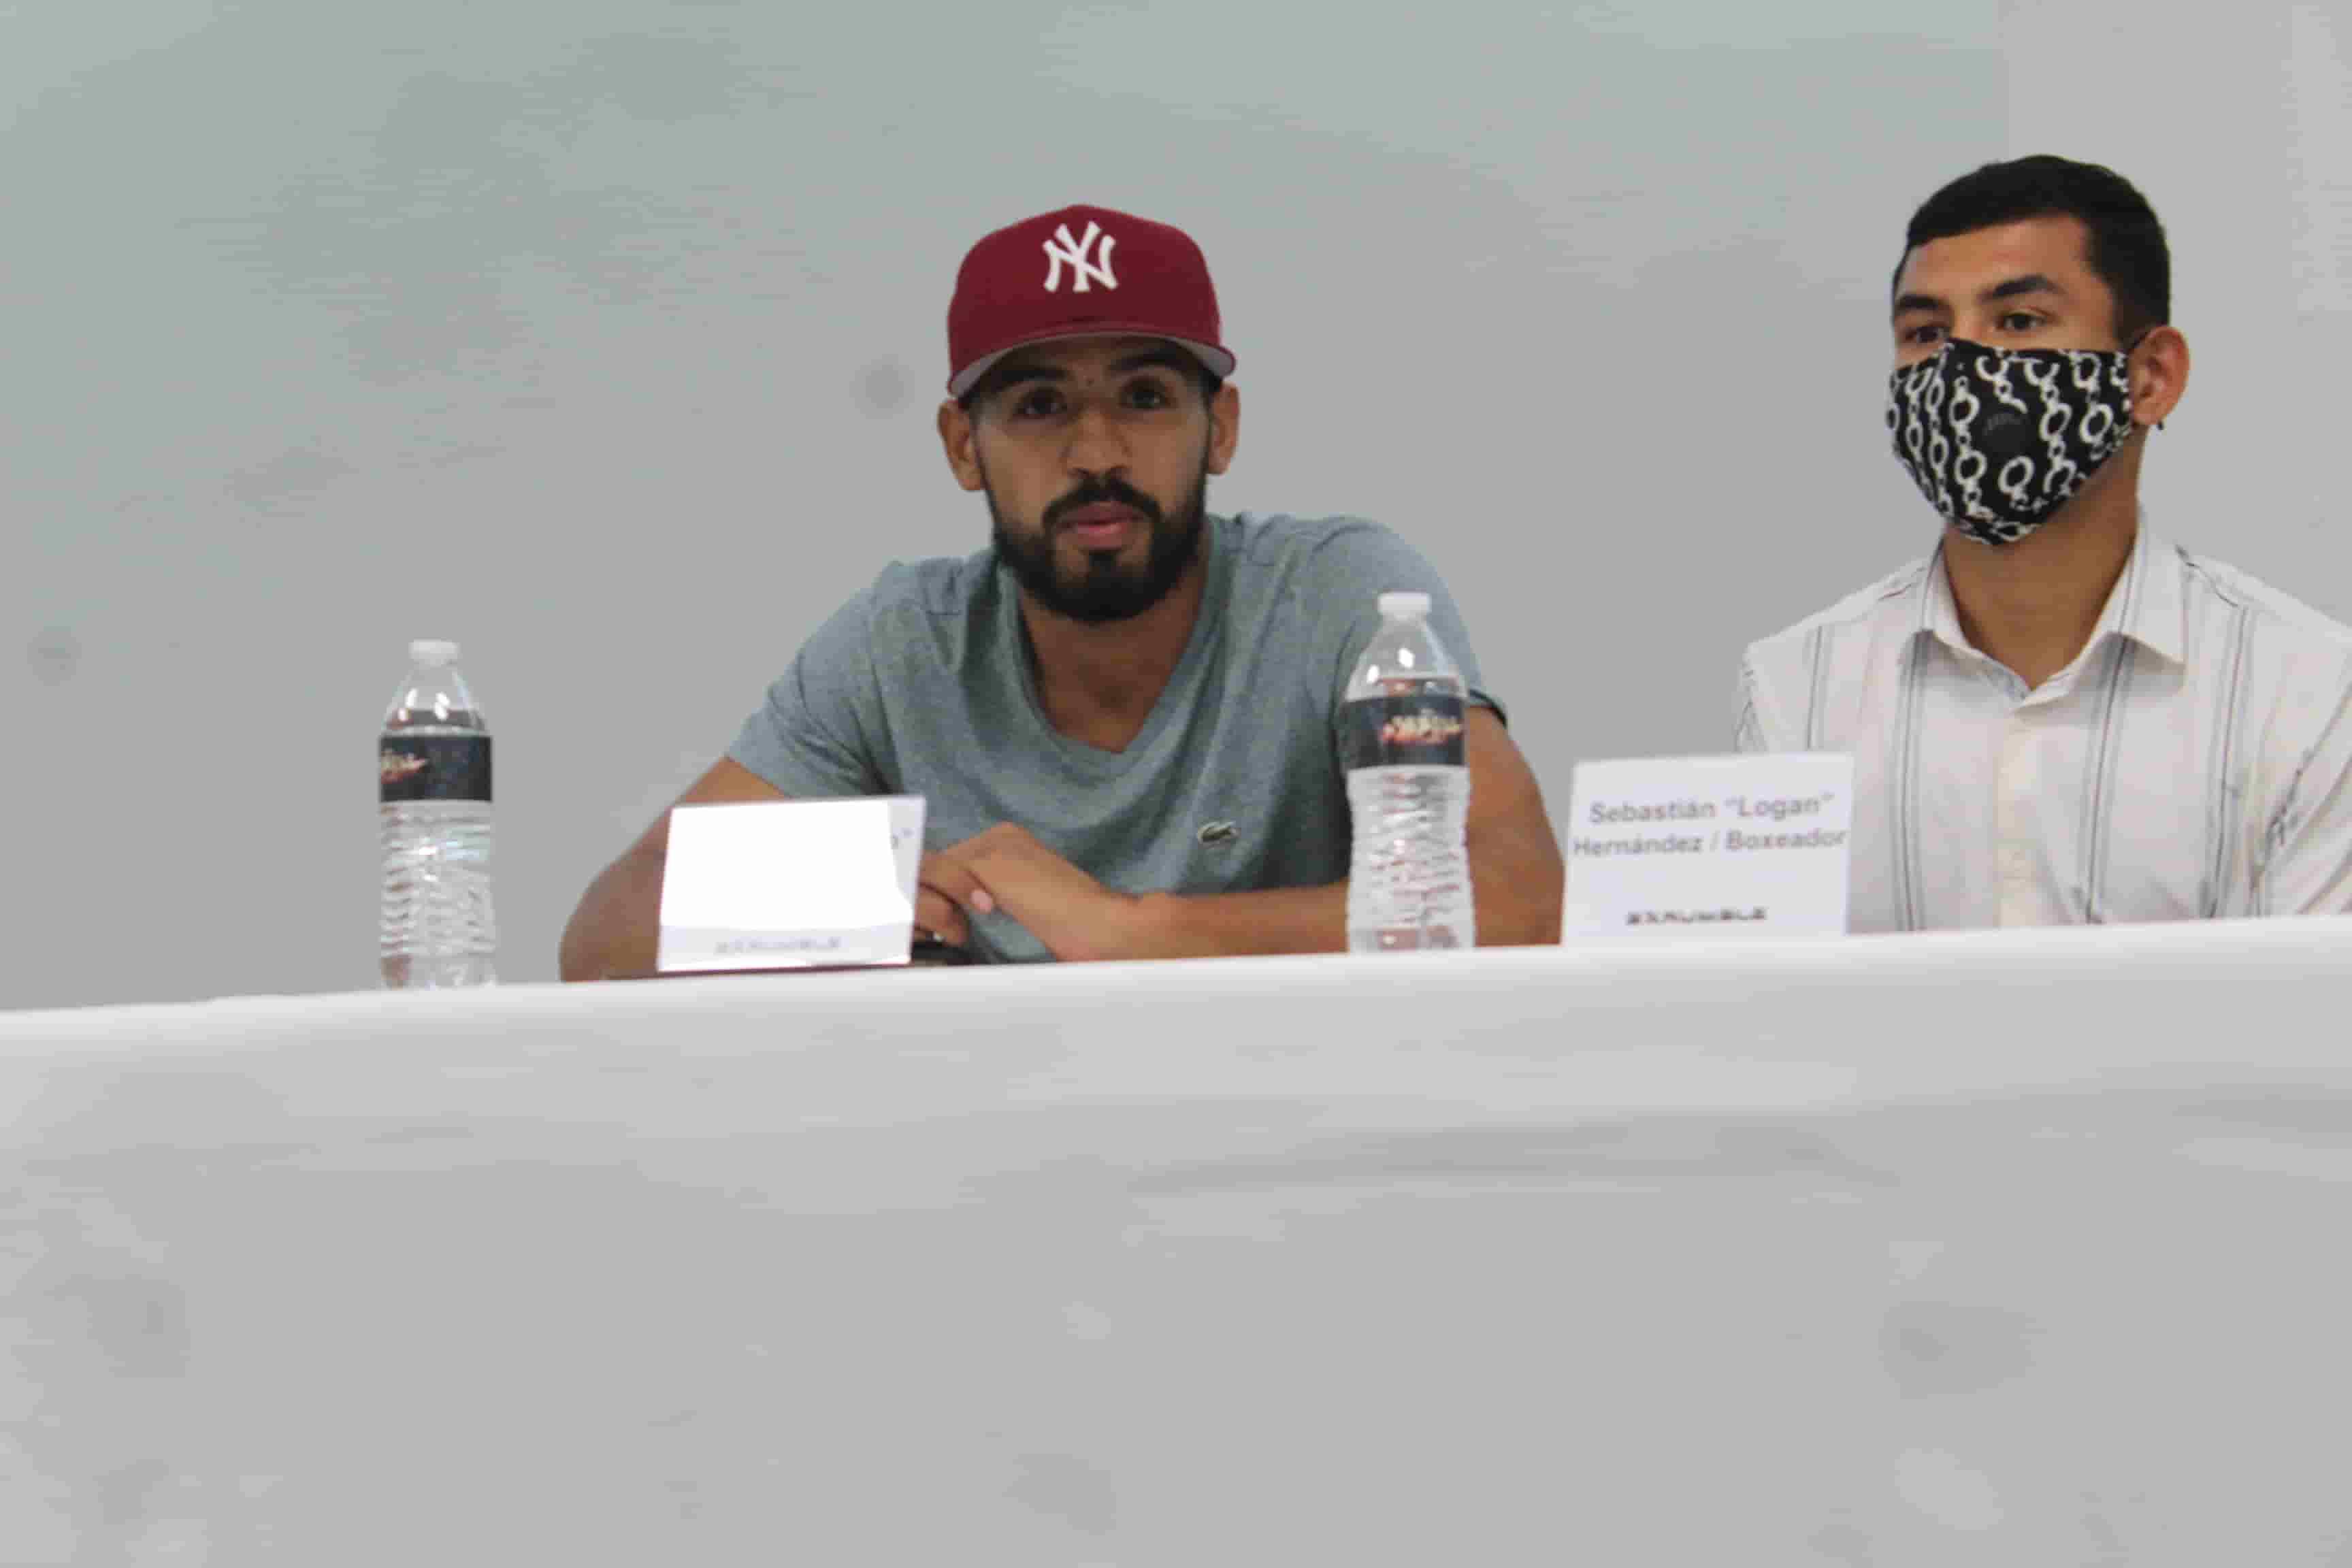 BX Rumble dio  a conocer detalles  sobre las peleas de box en Rumble Night